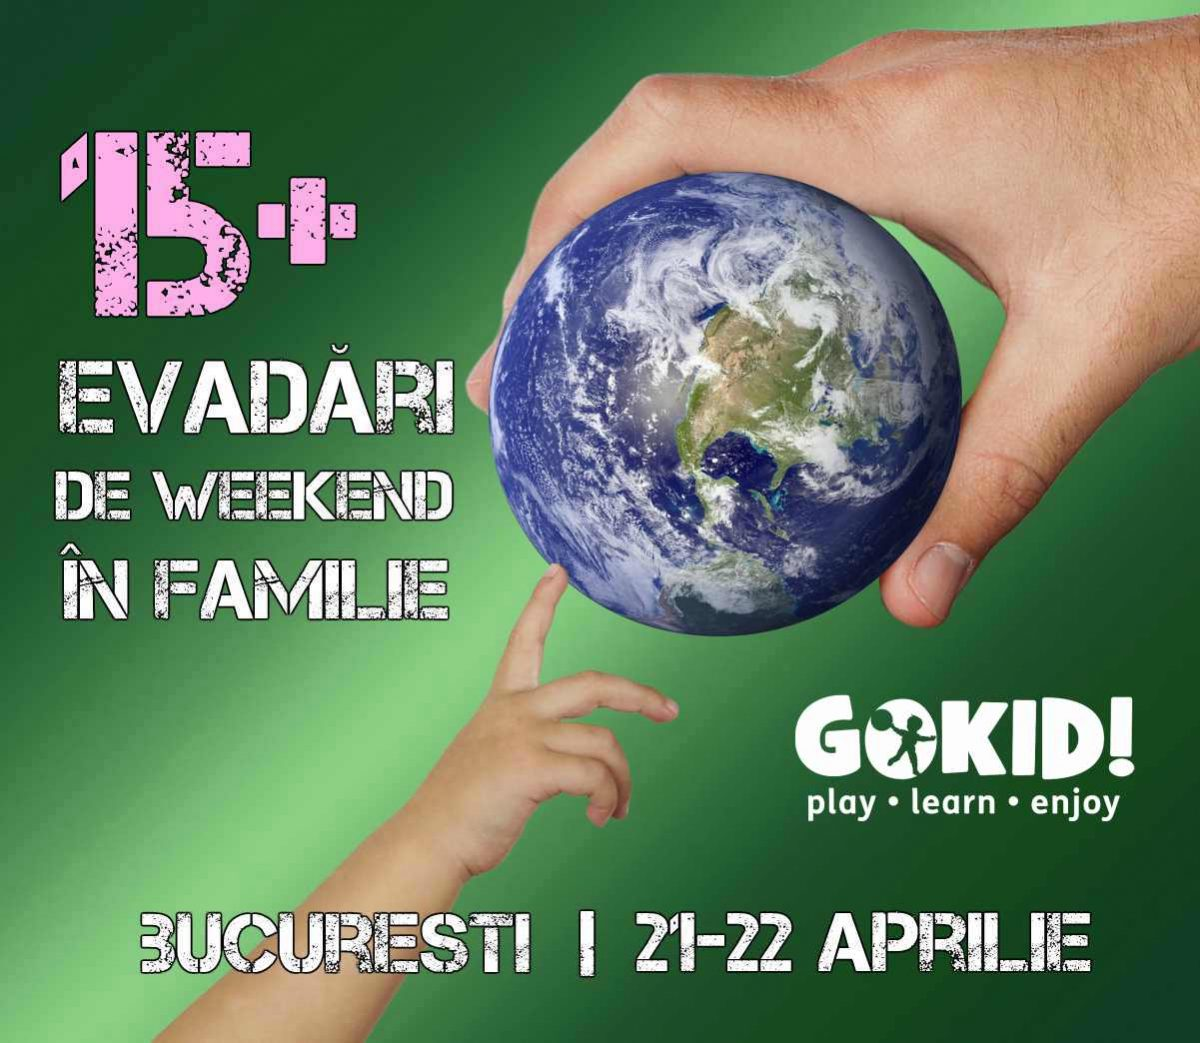 15+ Evadari de Weekend in Familie la Bucuresti   21-22 Aprilie